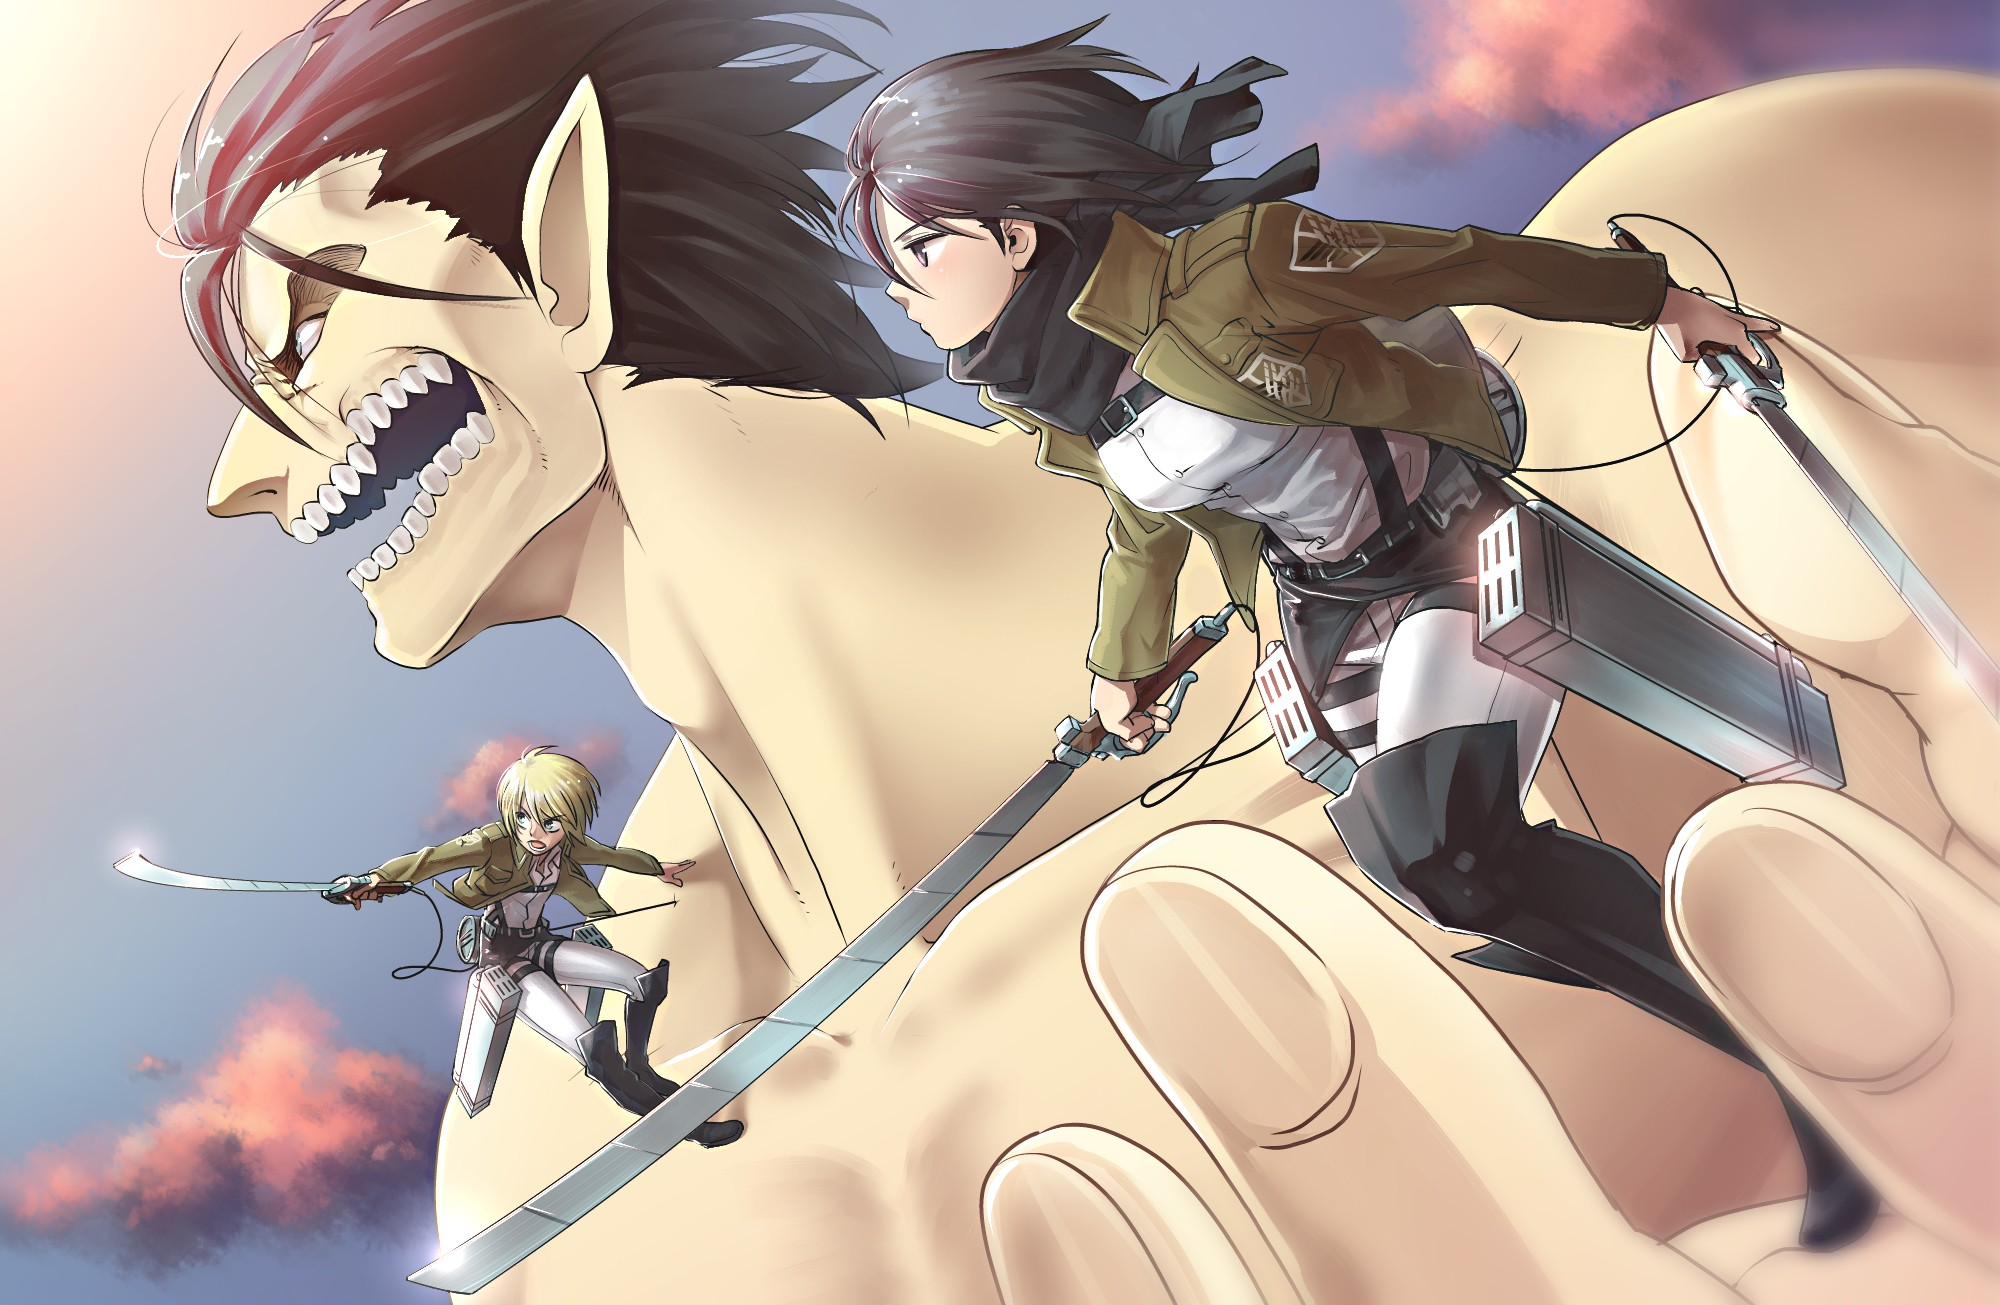 Armin Arlert Eren Yeager Mikasa Ackerman Wallpaper Resolution 2000x1305 Id 932102 Wallha Com